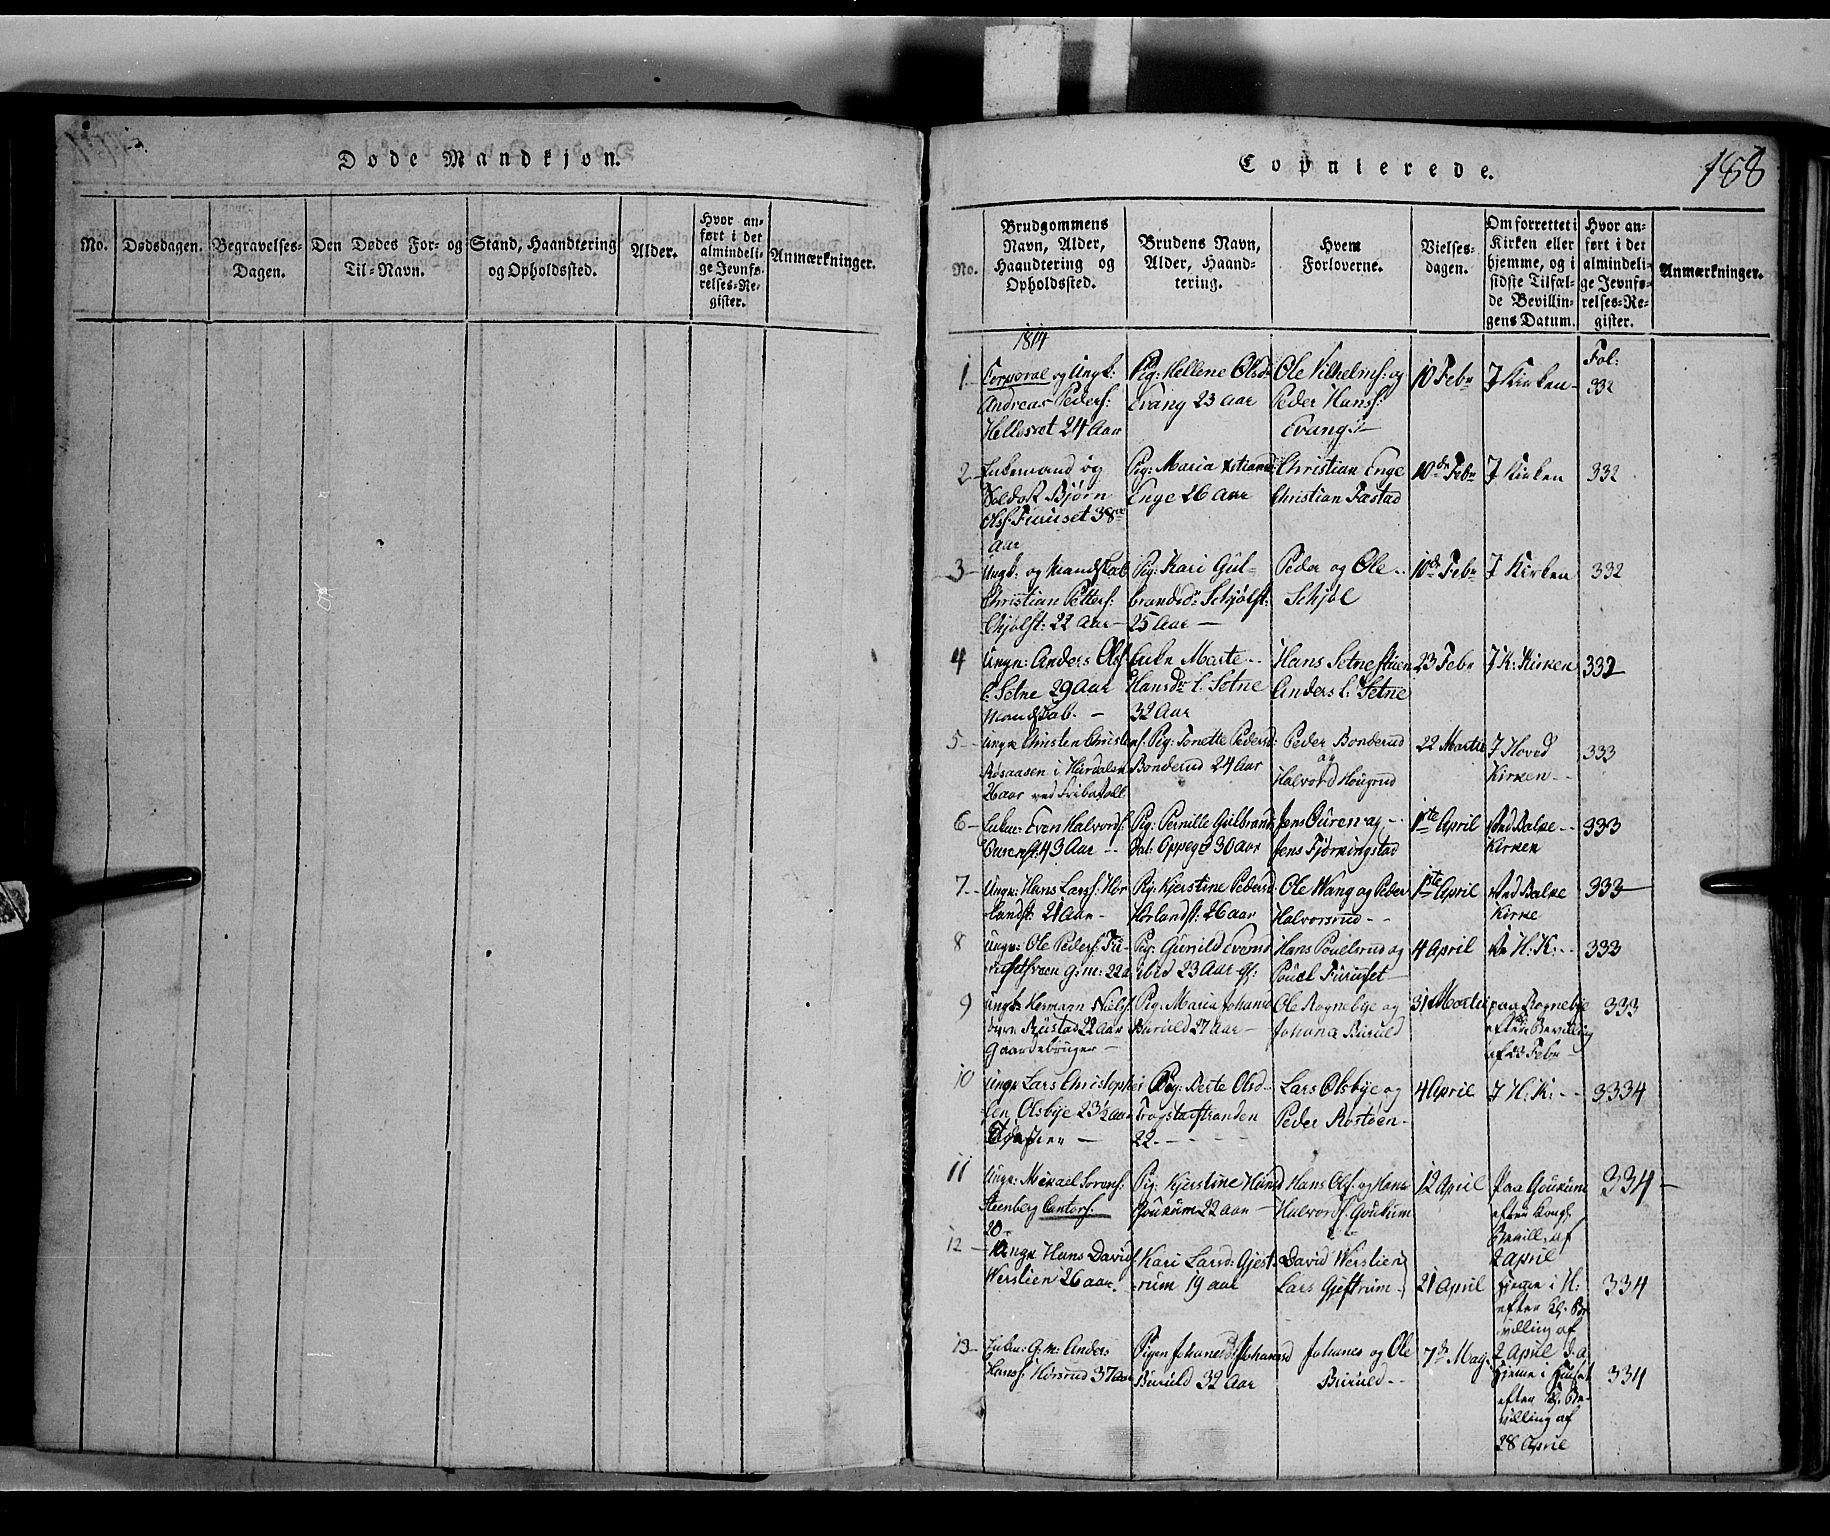 SAH, Toten prestekontor, Klokkerbok nr. 1, 1814-1820, s. 188